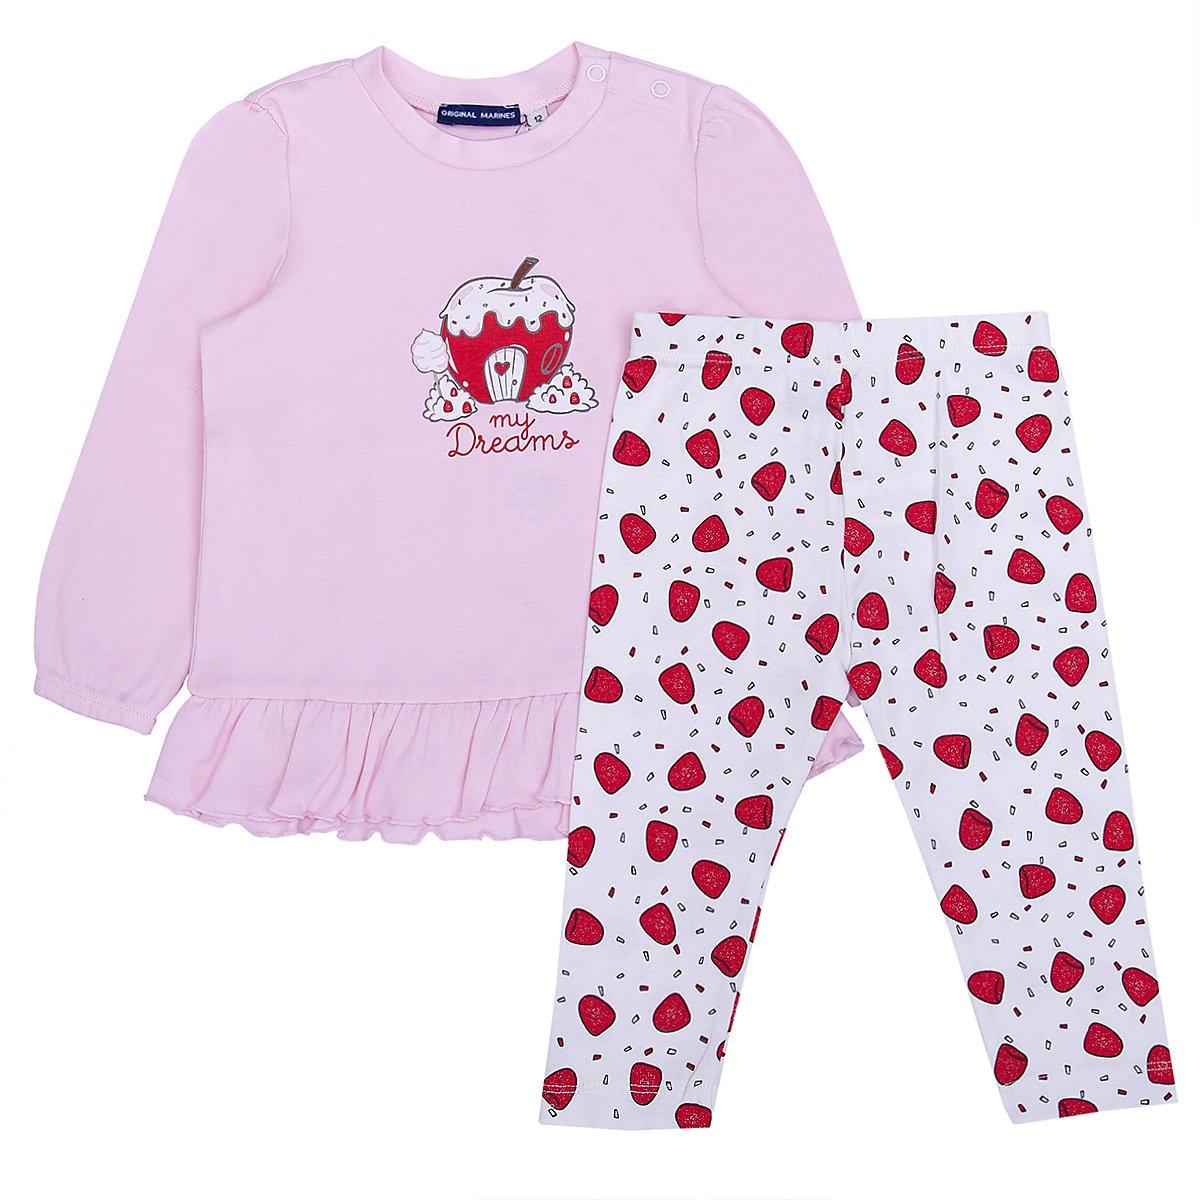 ORIGINAL MARINES Sleepwear & Robes 9500984 Cotton Baby Girls clothing pajamas wu nong wudang tai chi clothing robes uniforms surplices men and women hanfu taijiquan clothing coat winter thick robe